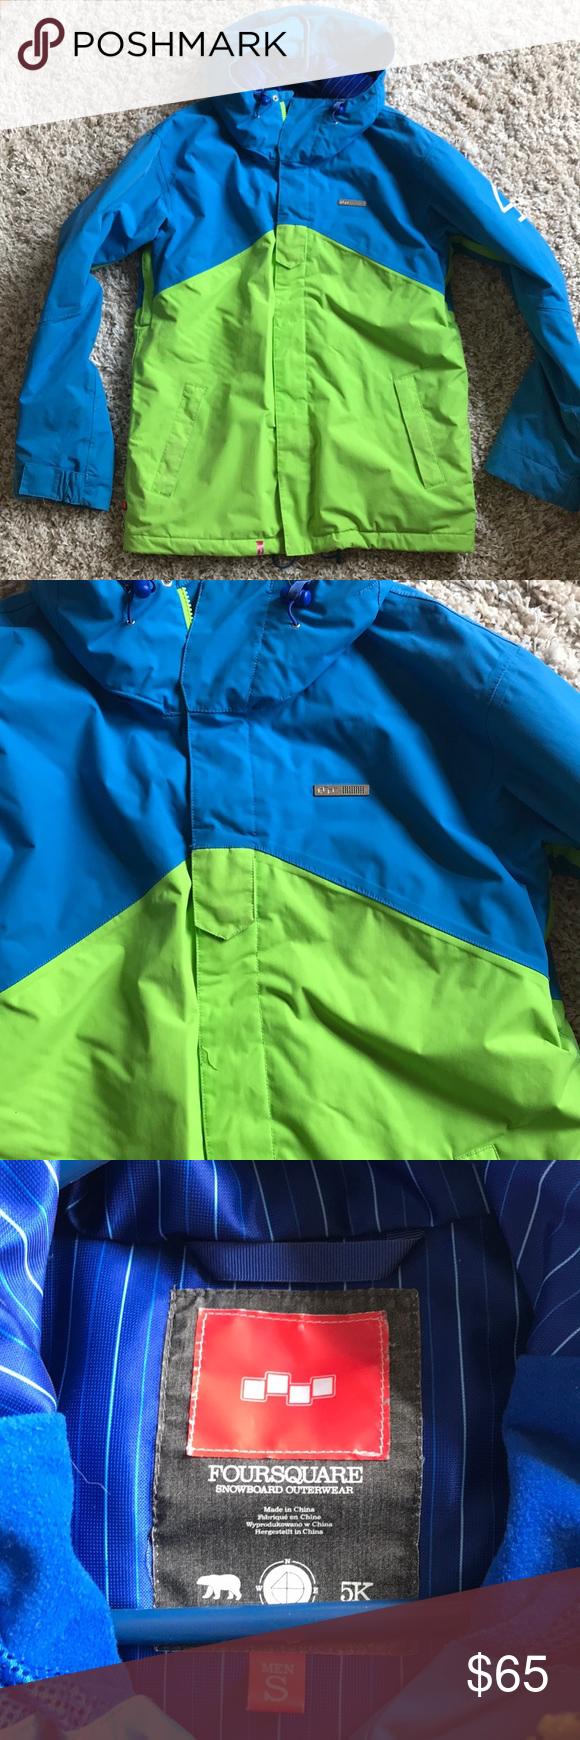 Electric Blue Active Jacket w Many Pockets